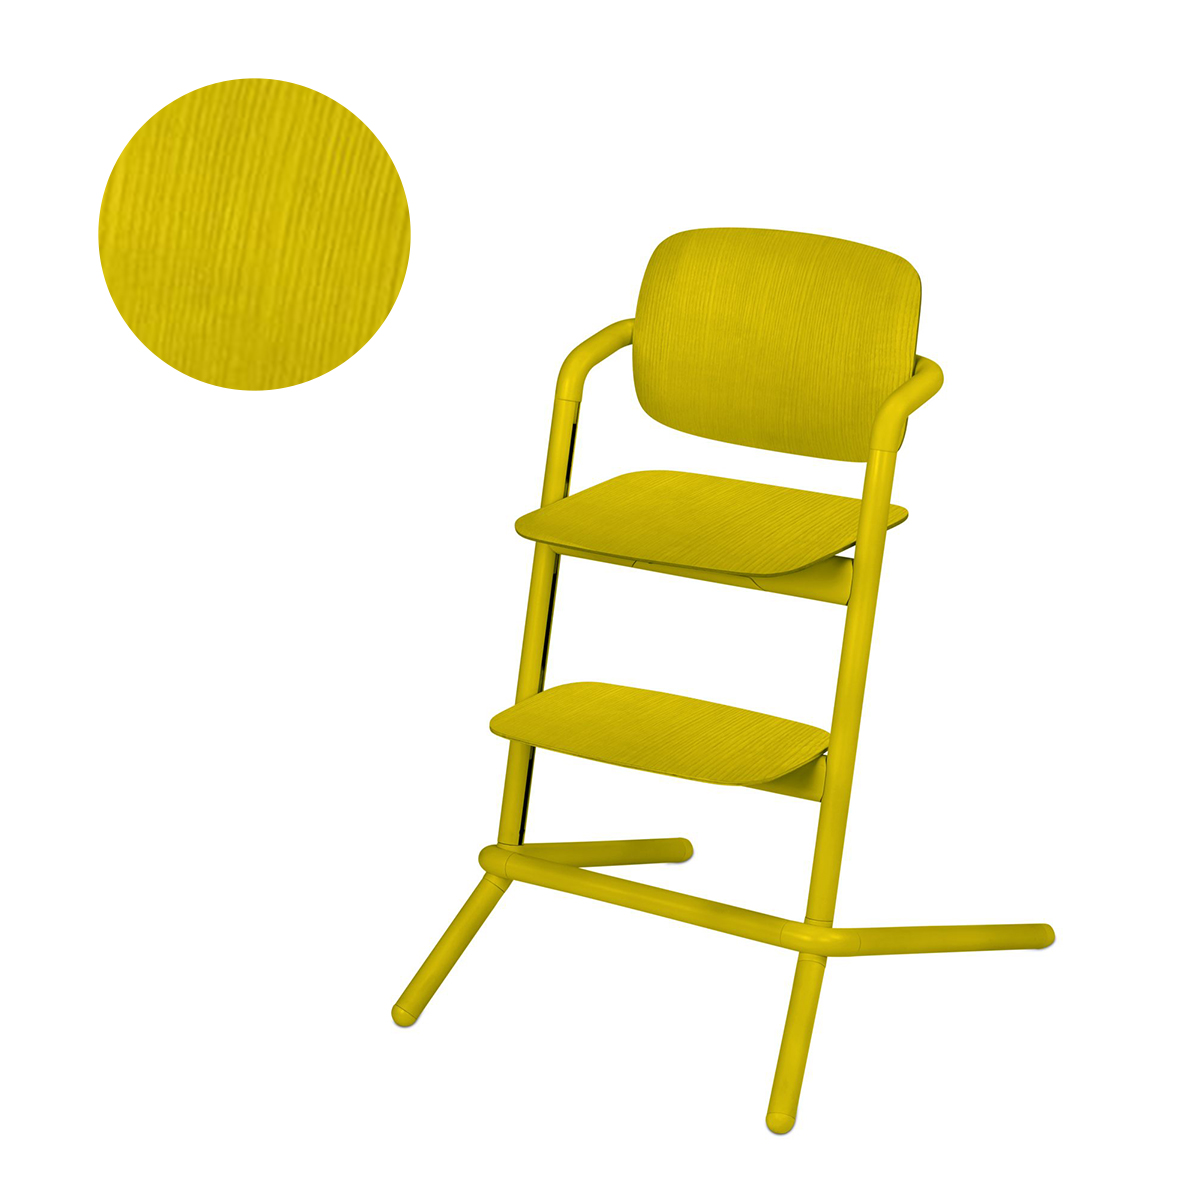 lemo_cybex_yellow_chaise_haute_bois_1